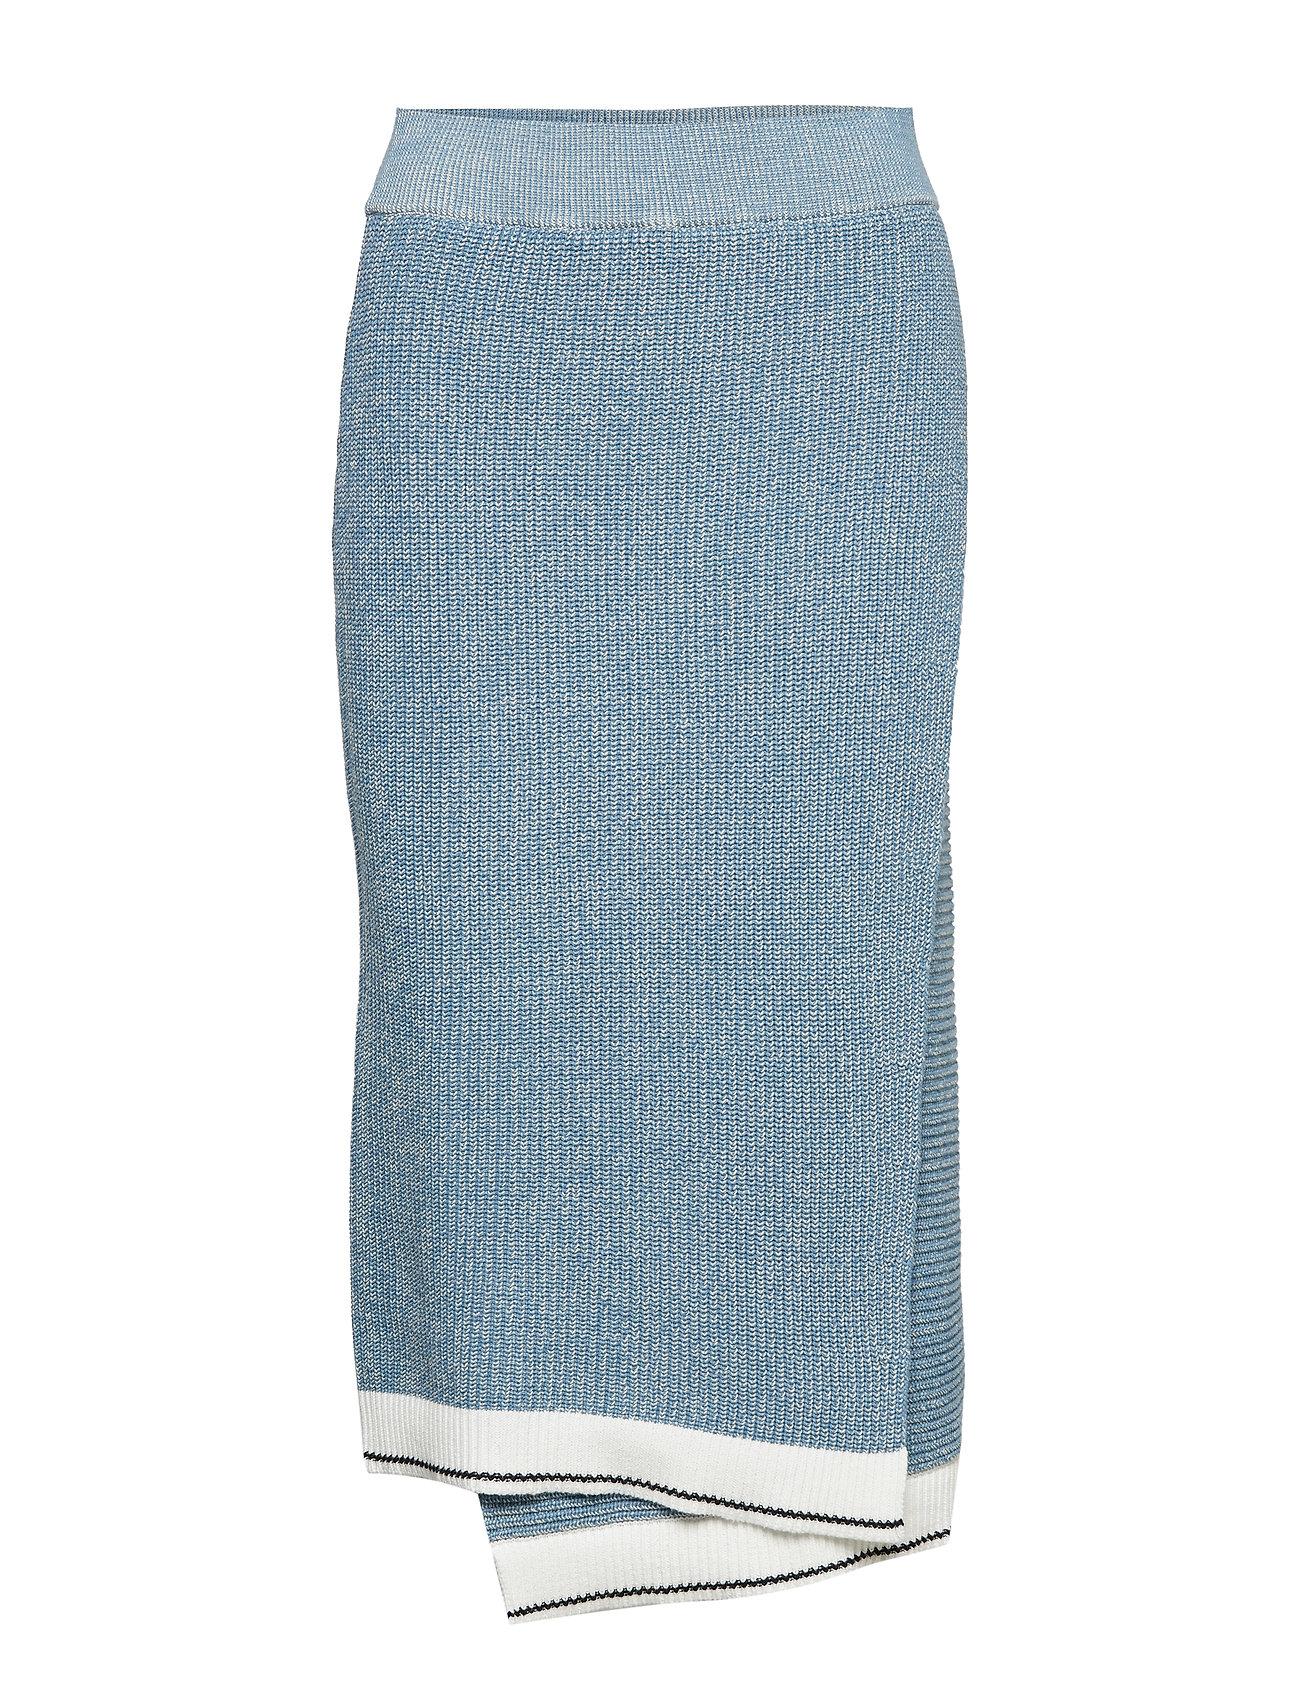 HOLZWEILER VILLA Skirt - BLUE